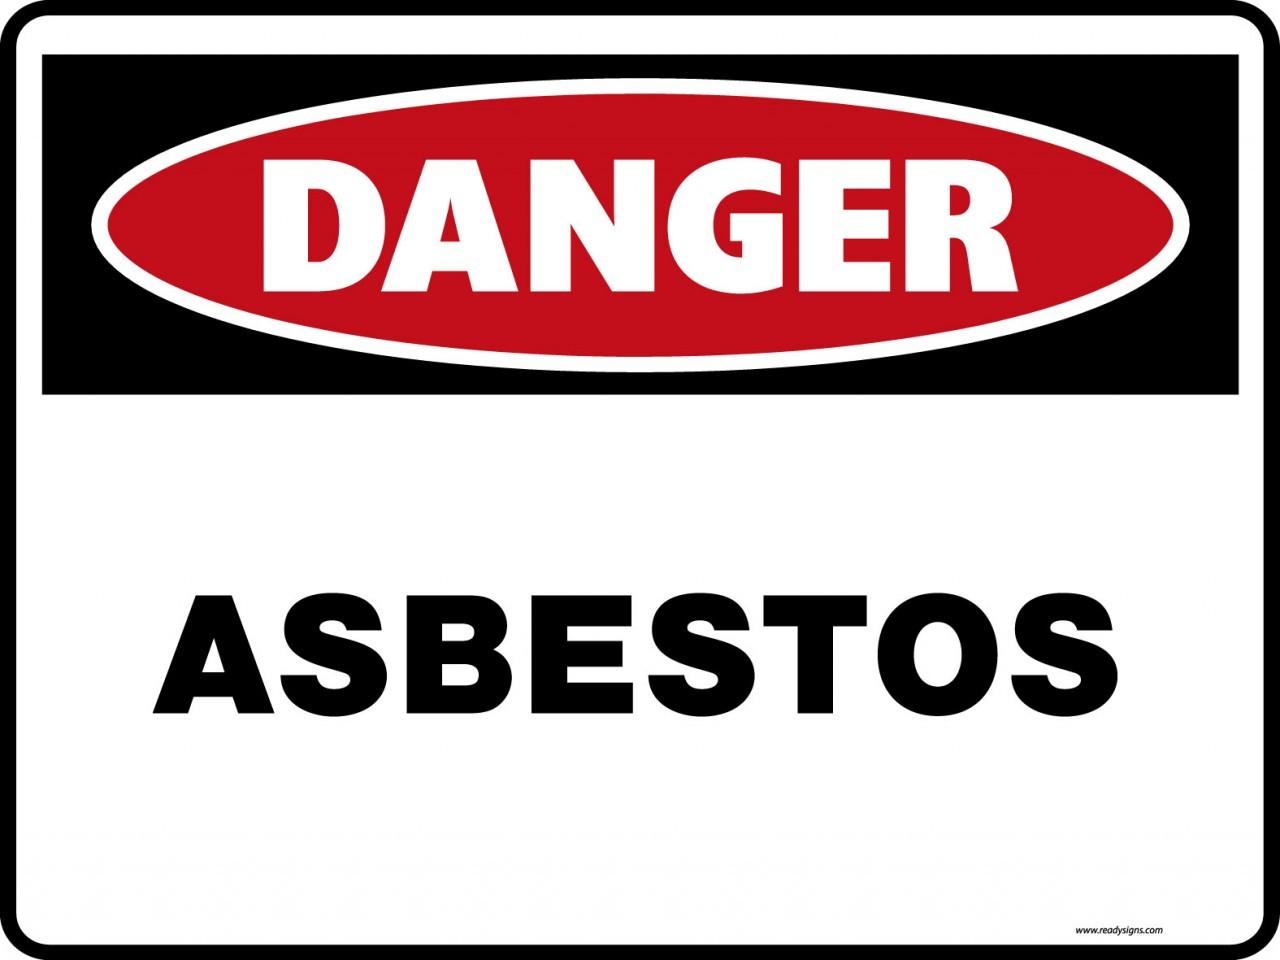 asbestos warning signs clipart best. Black Bedroom Furniture Sets. Home Design Ideas